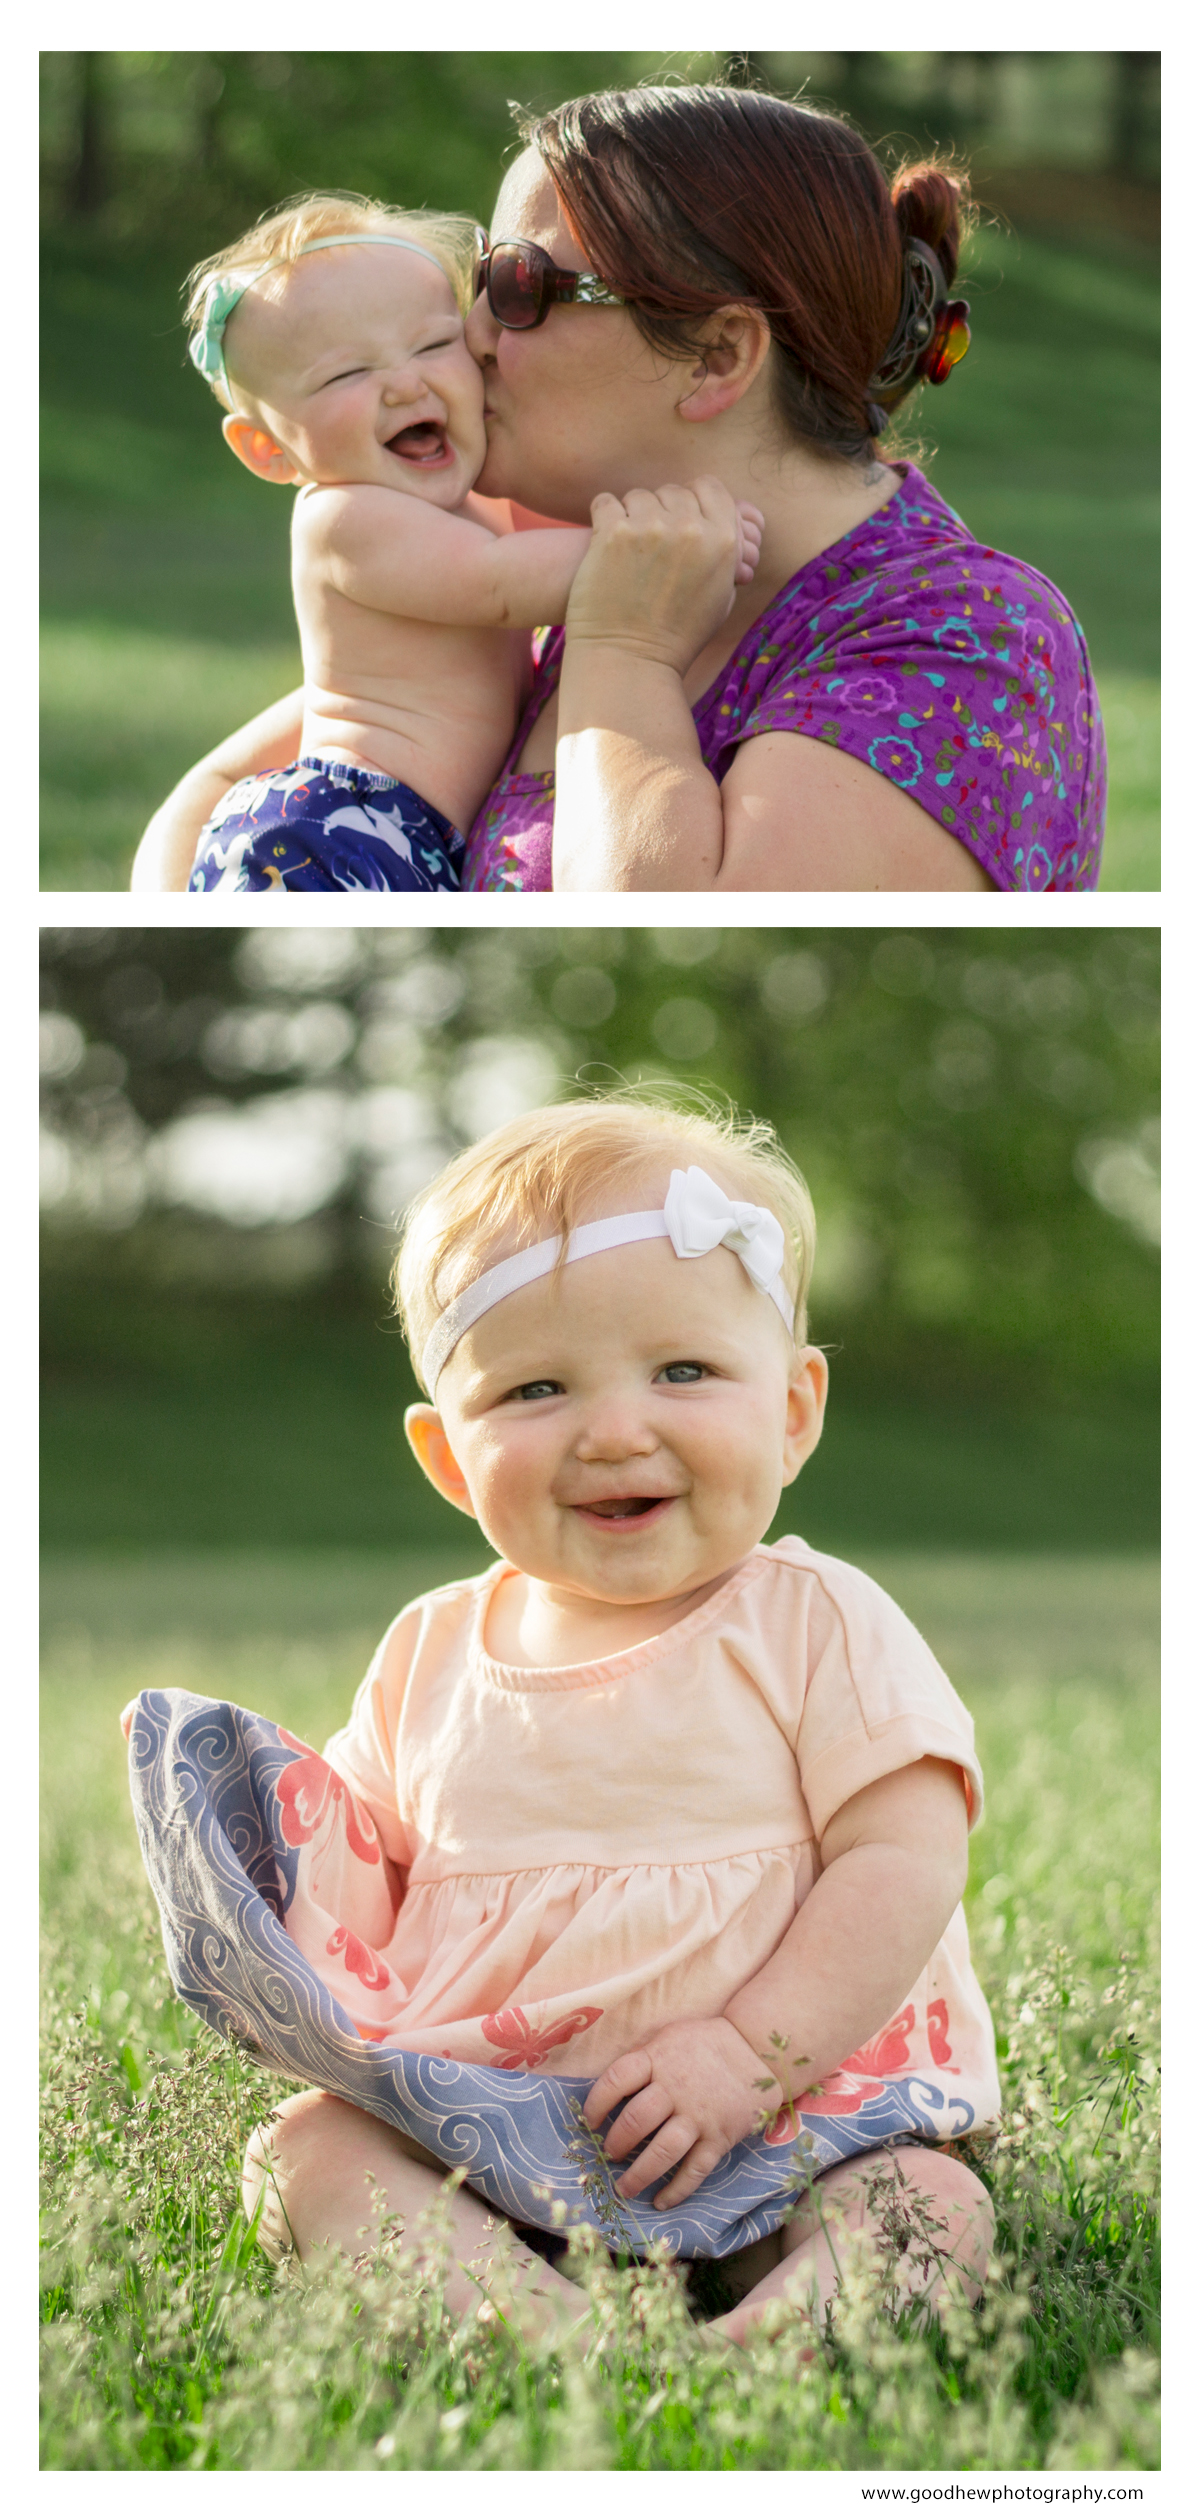 Jackson, Michigan - Half way through baby's first year photography plan at 6 months